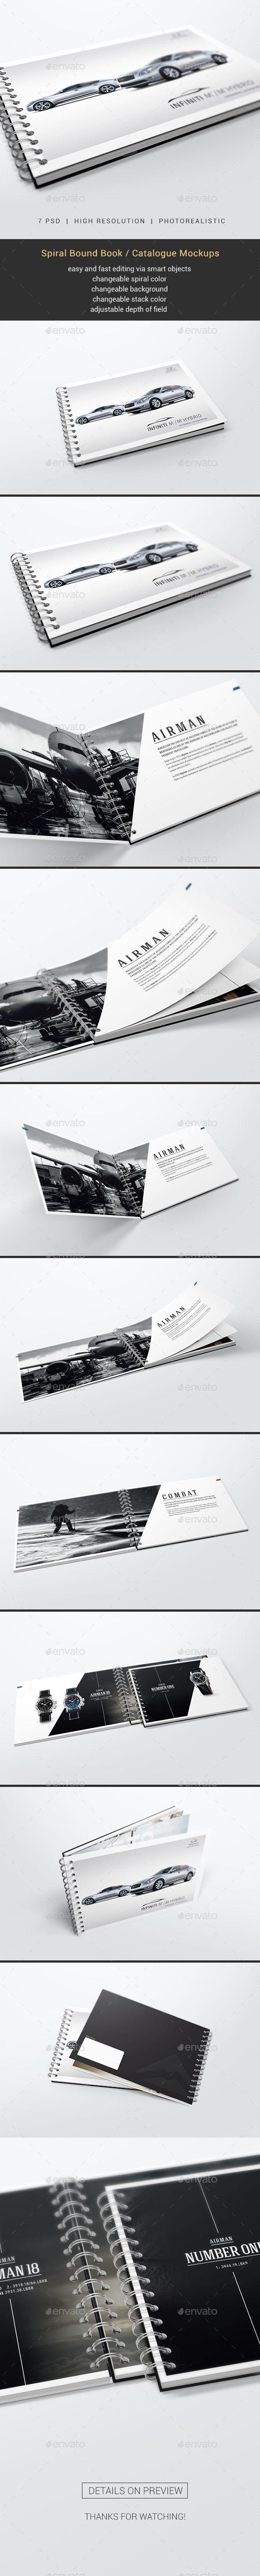 Spiral Bound Book / Catalogue Mockups by StreetD Spiral